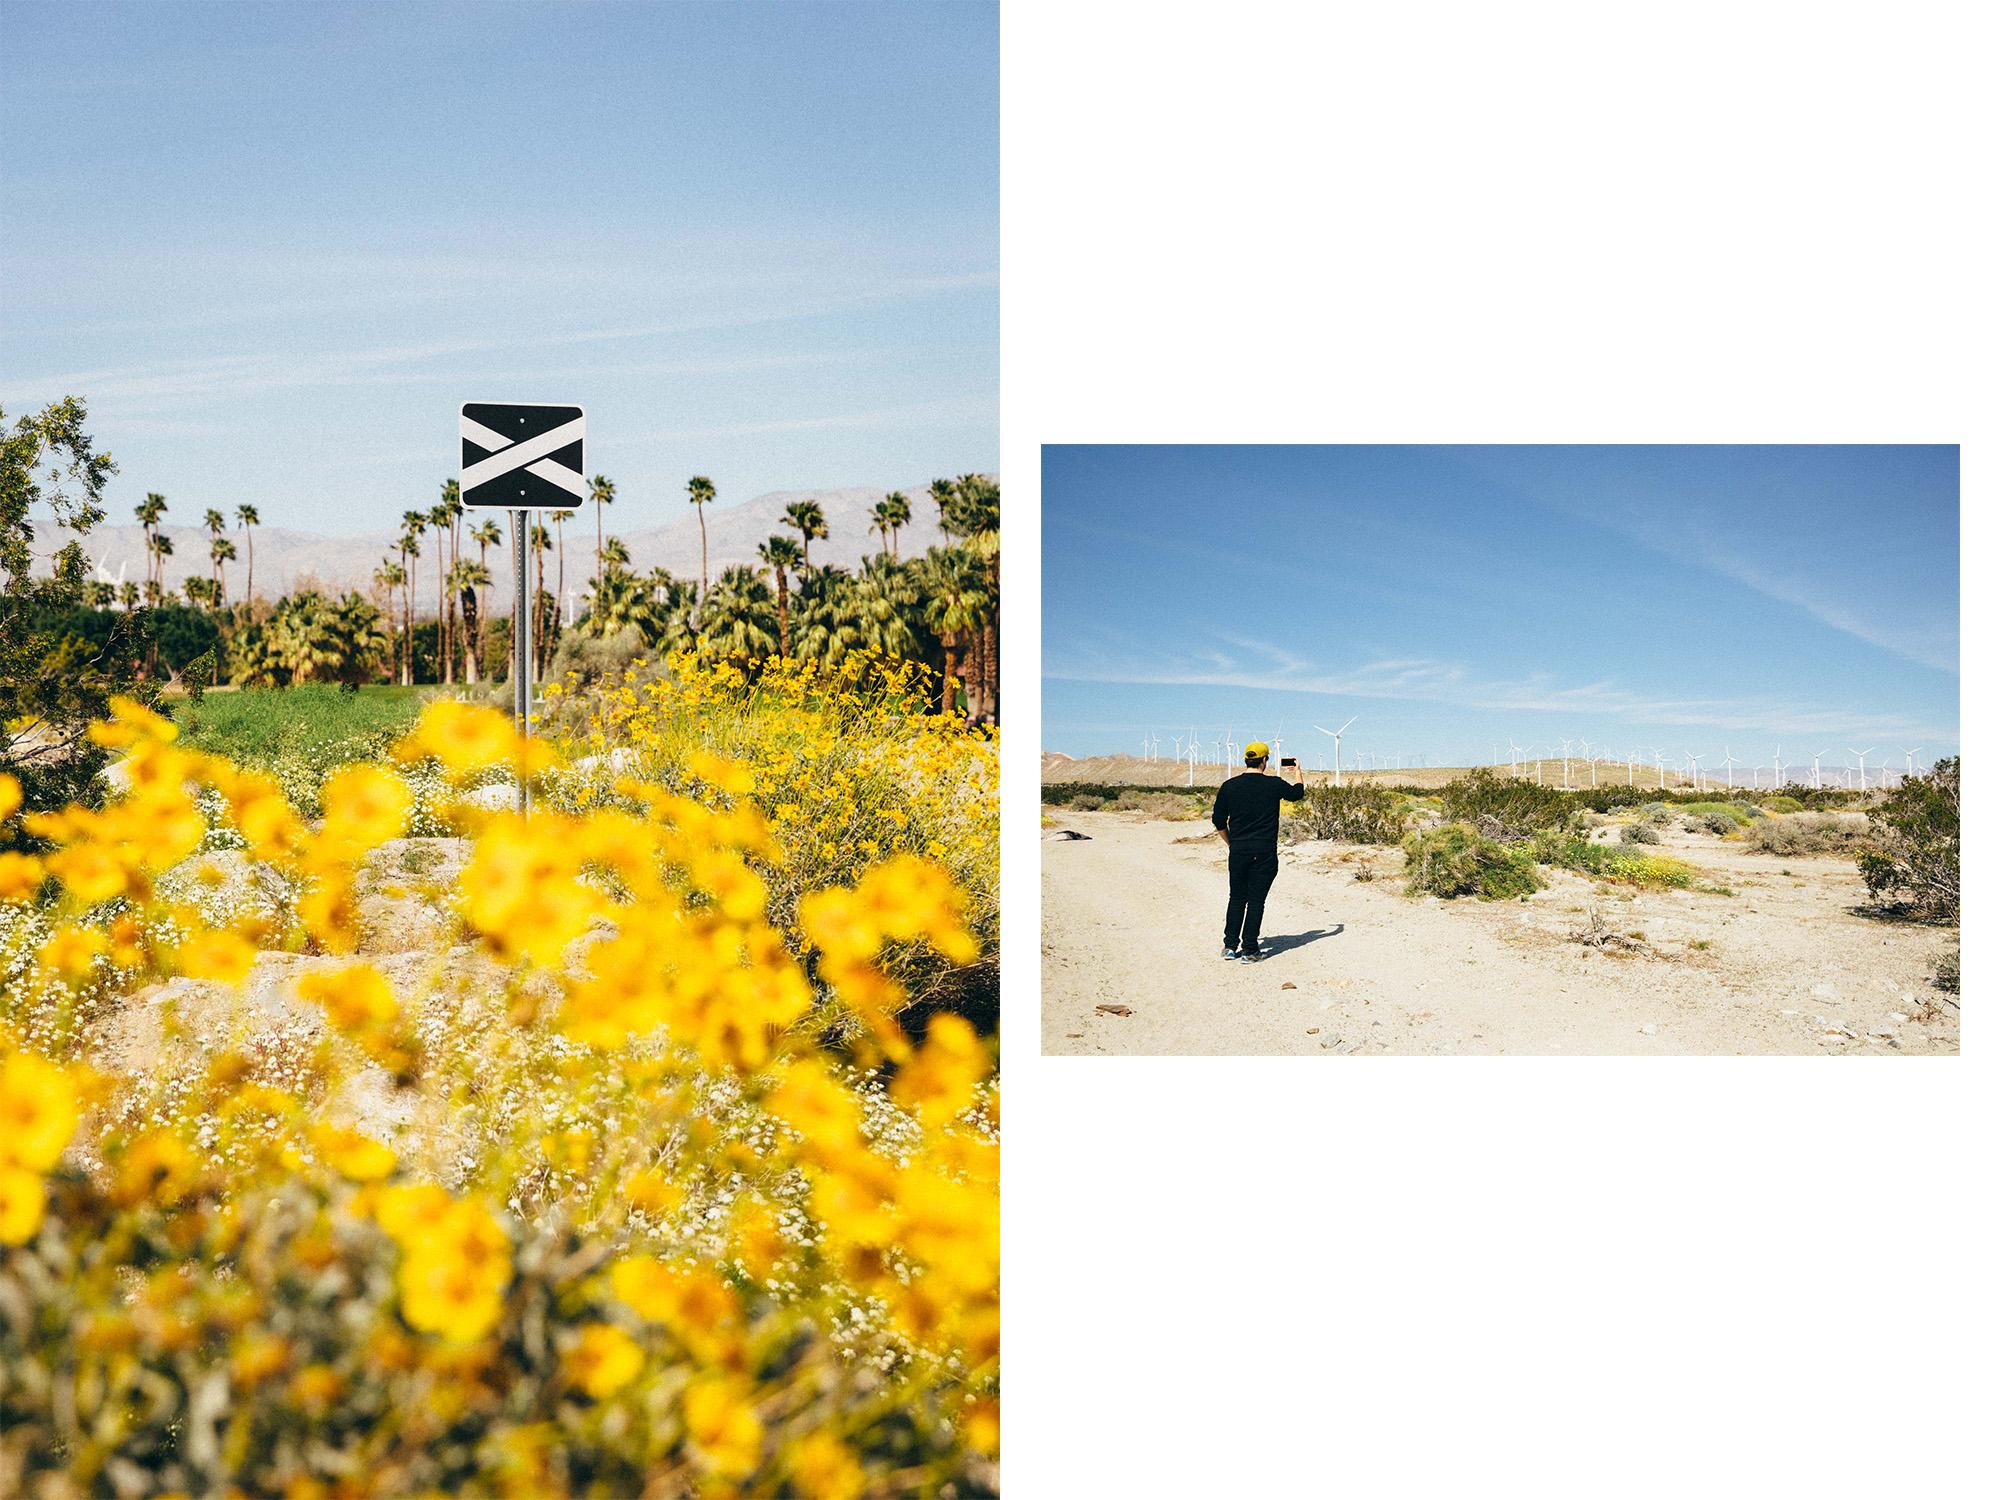 Desert X (Personal Work)